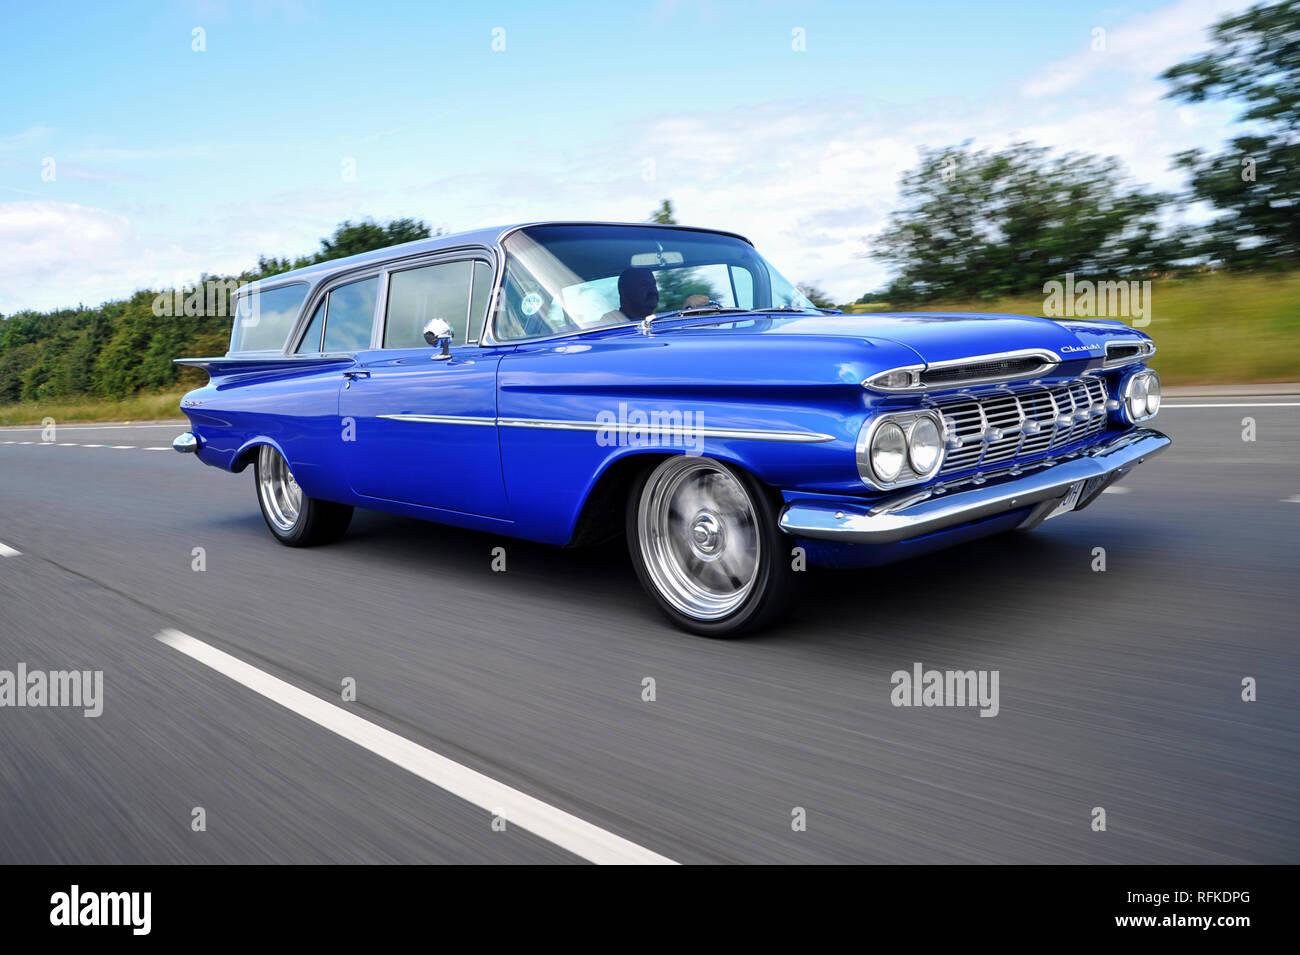 Customised 1959 Chevrolet Brookwood Classic American 2